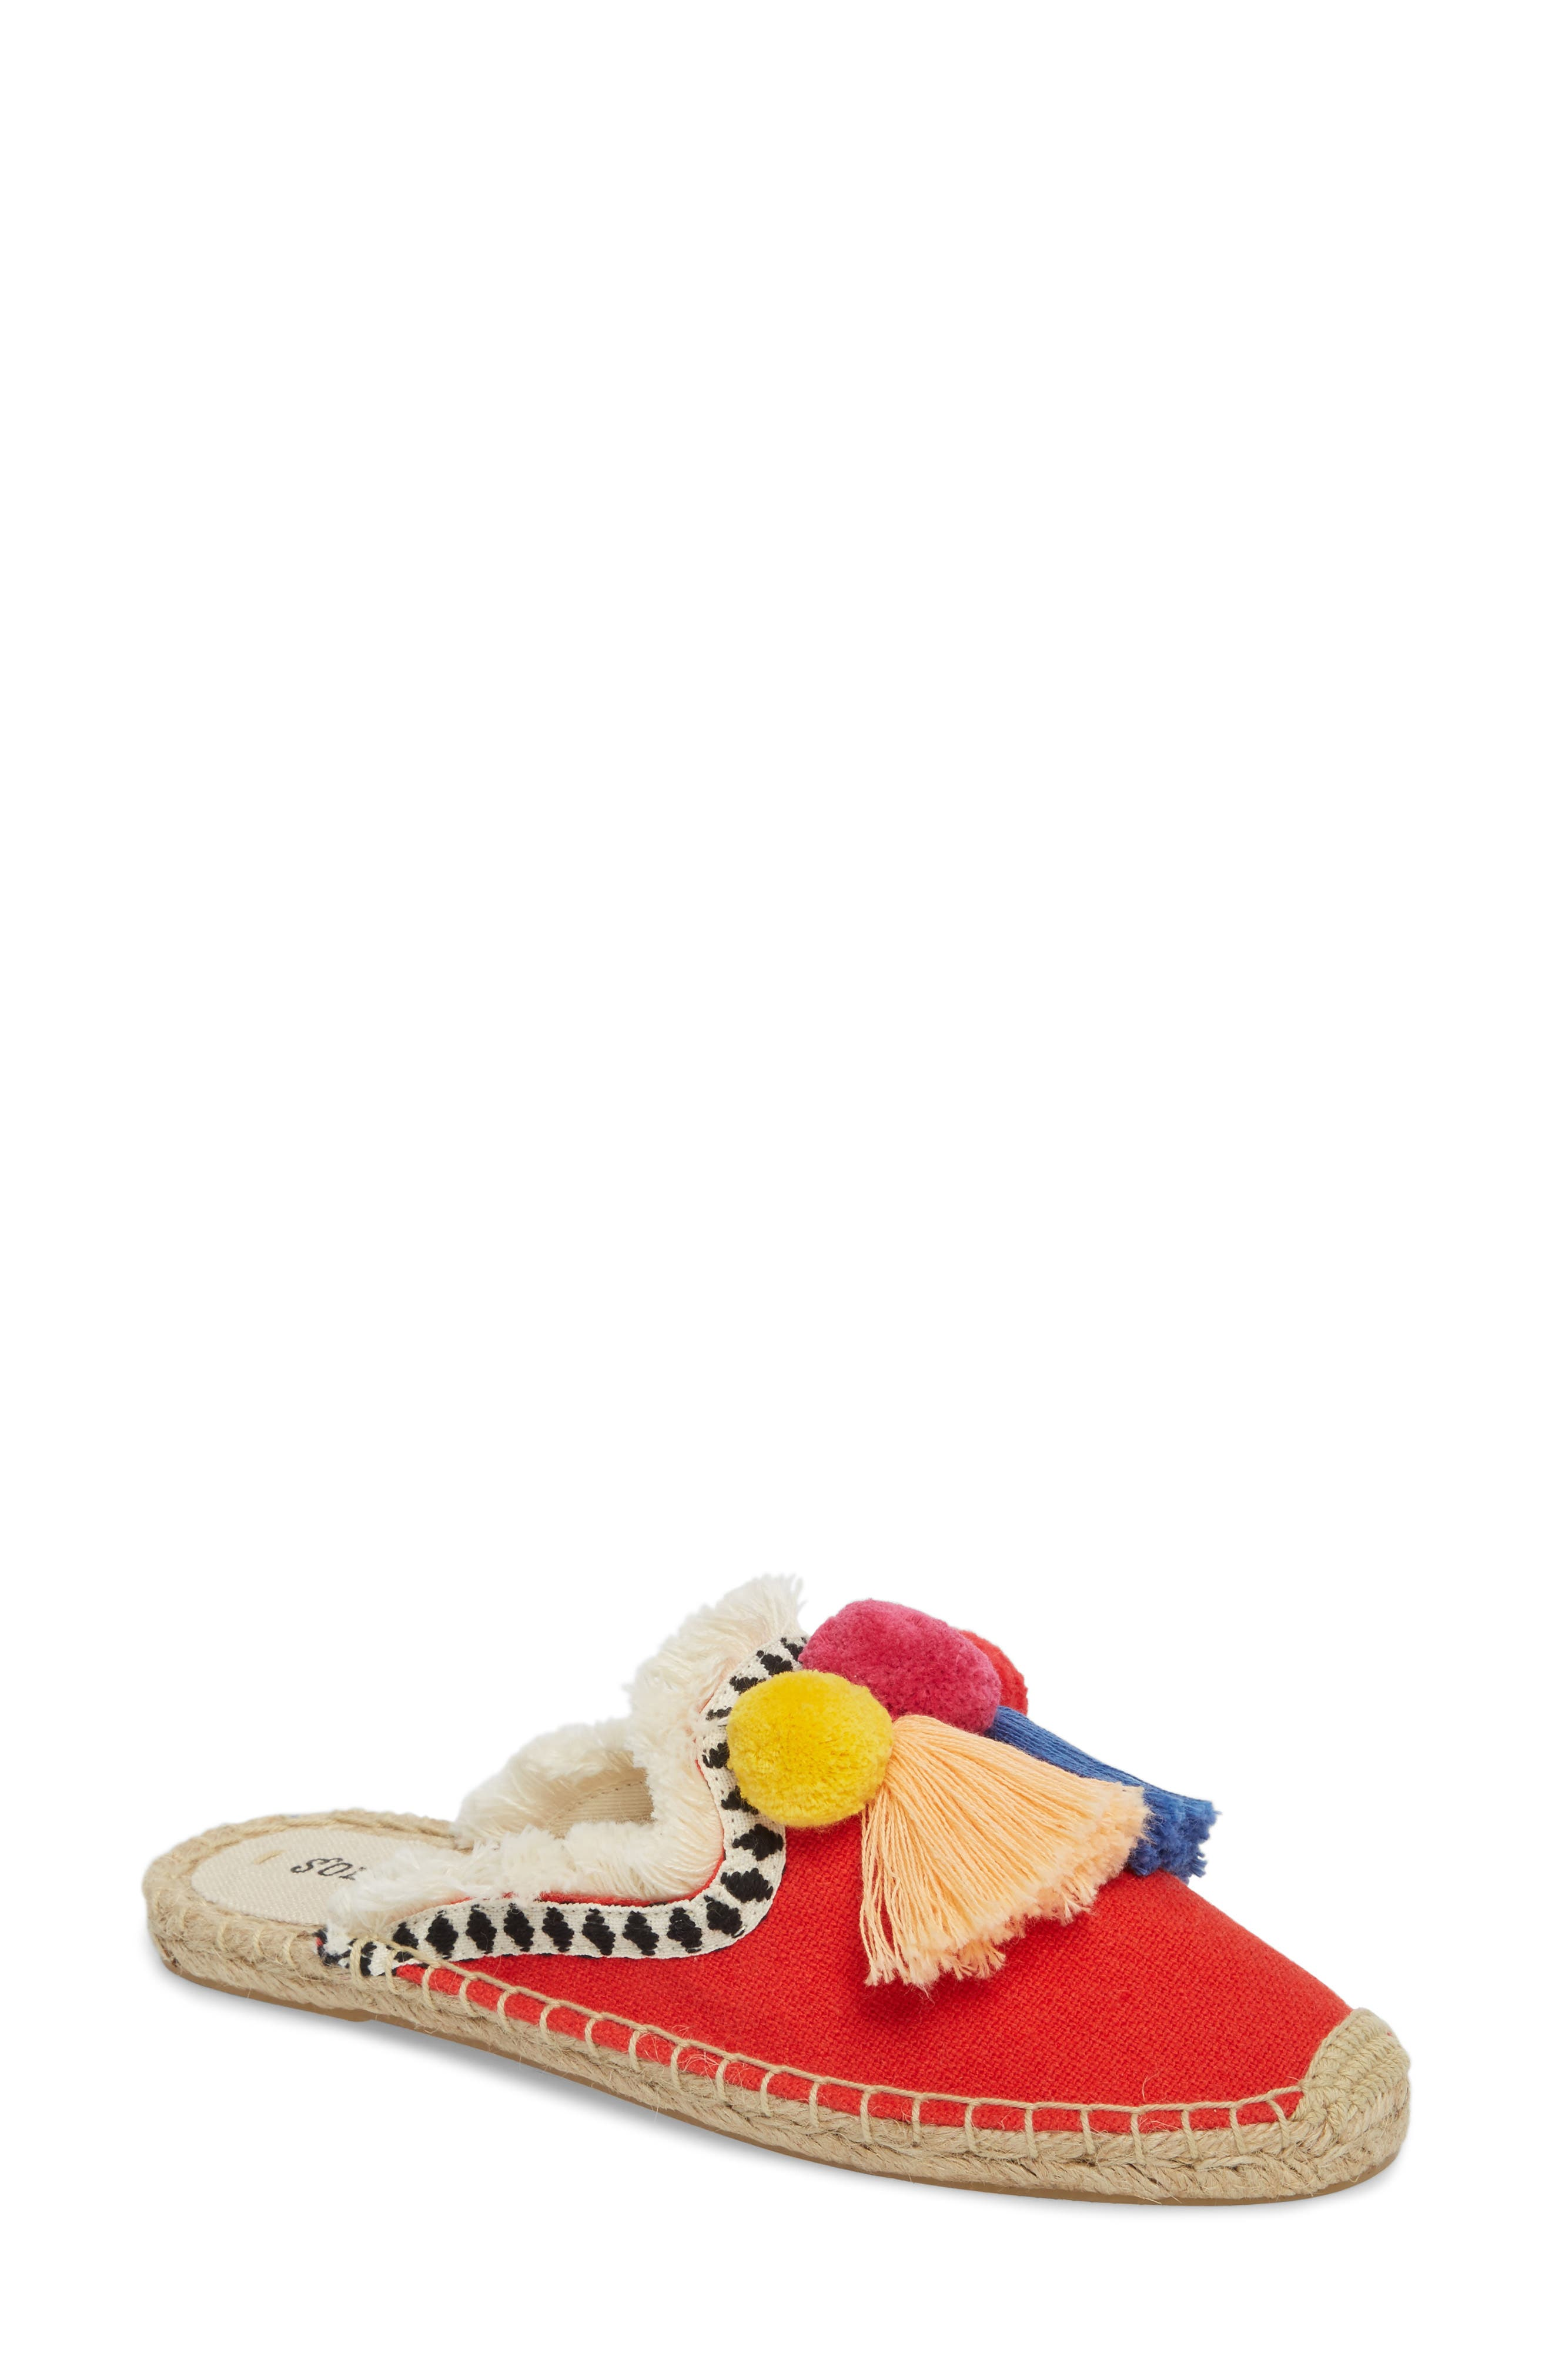 Pompom Espadrille Mule,                         Main,                         color, RED MULTI CANVAS